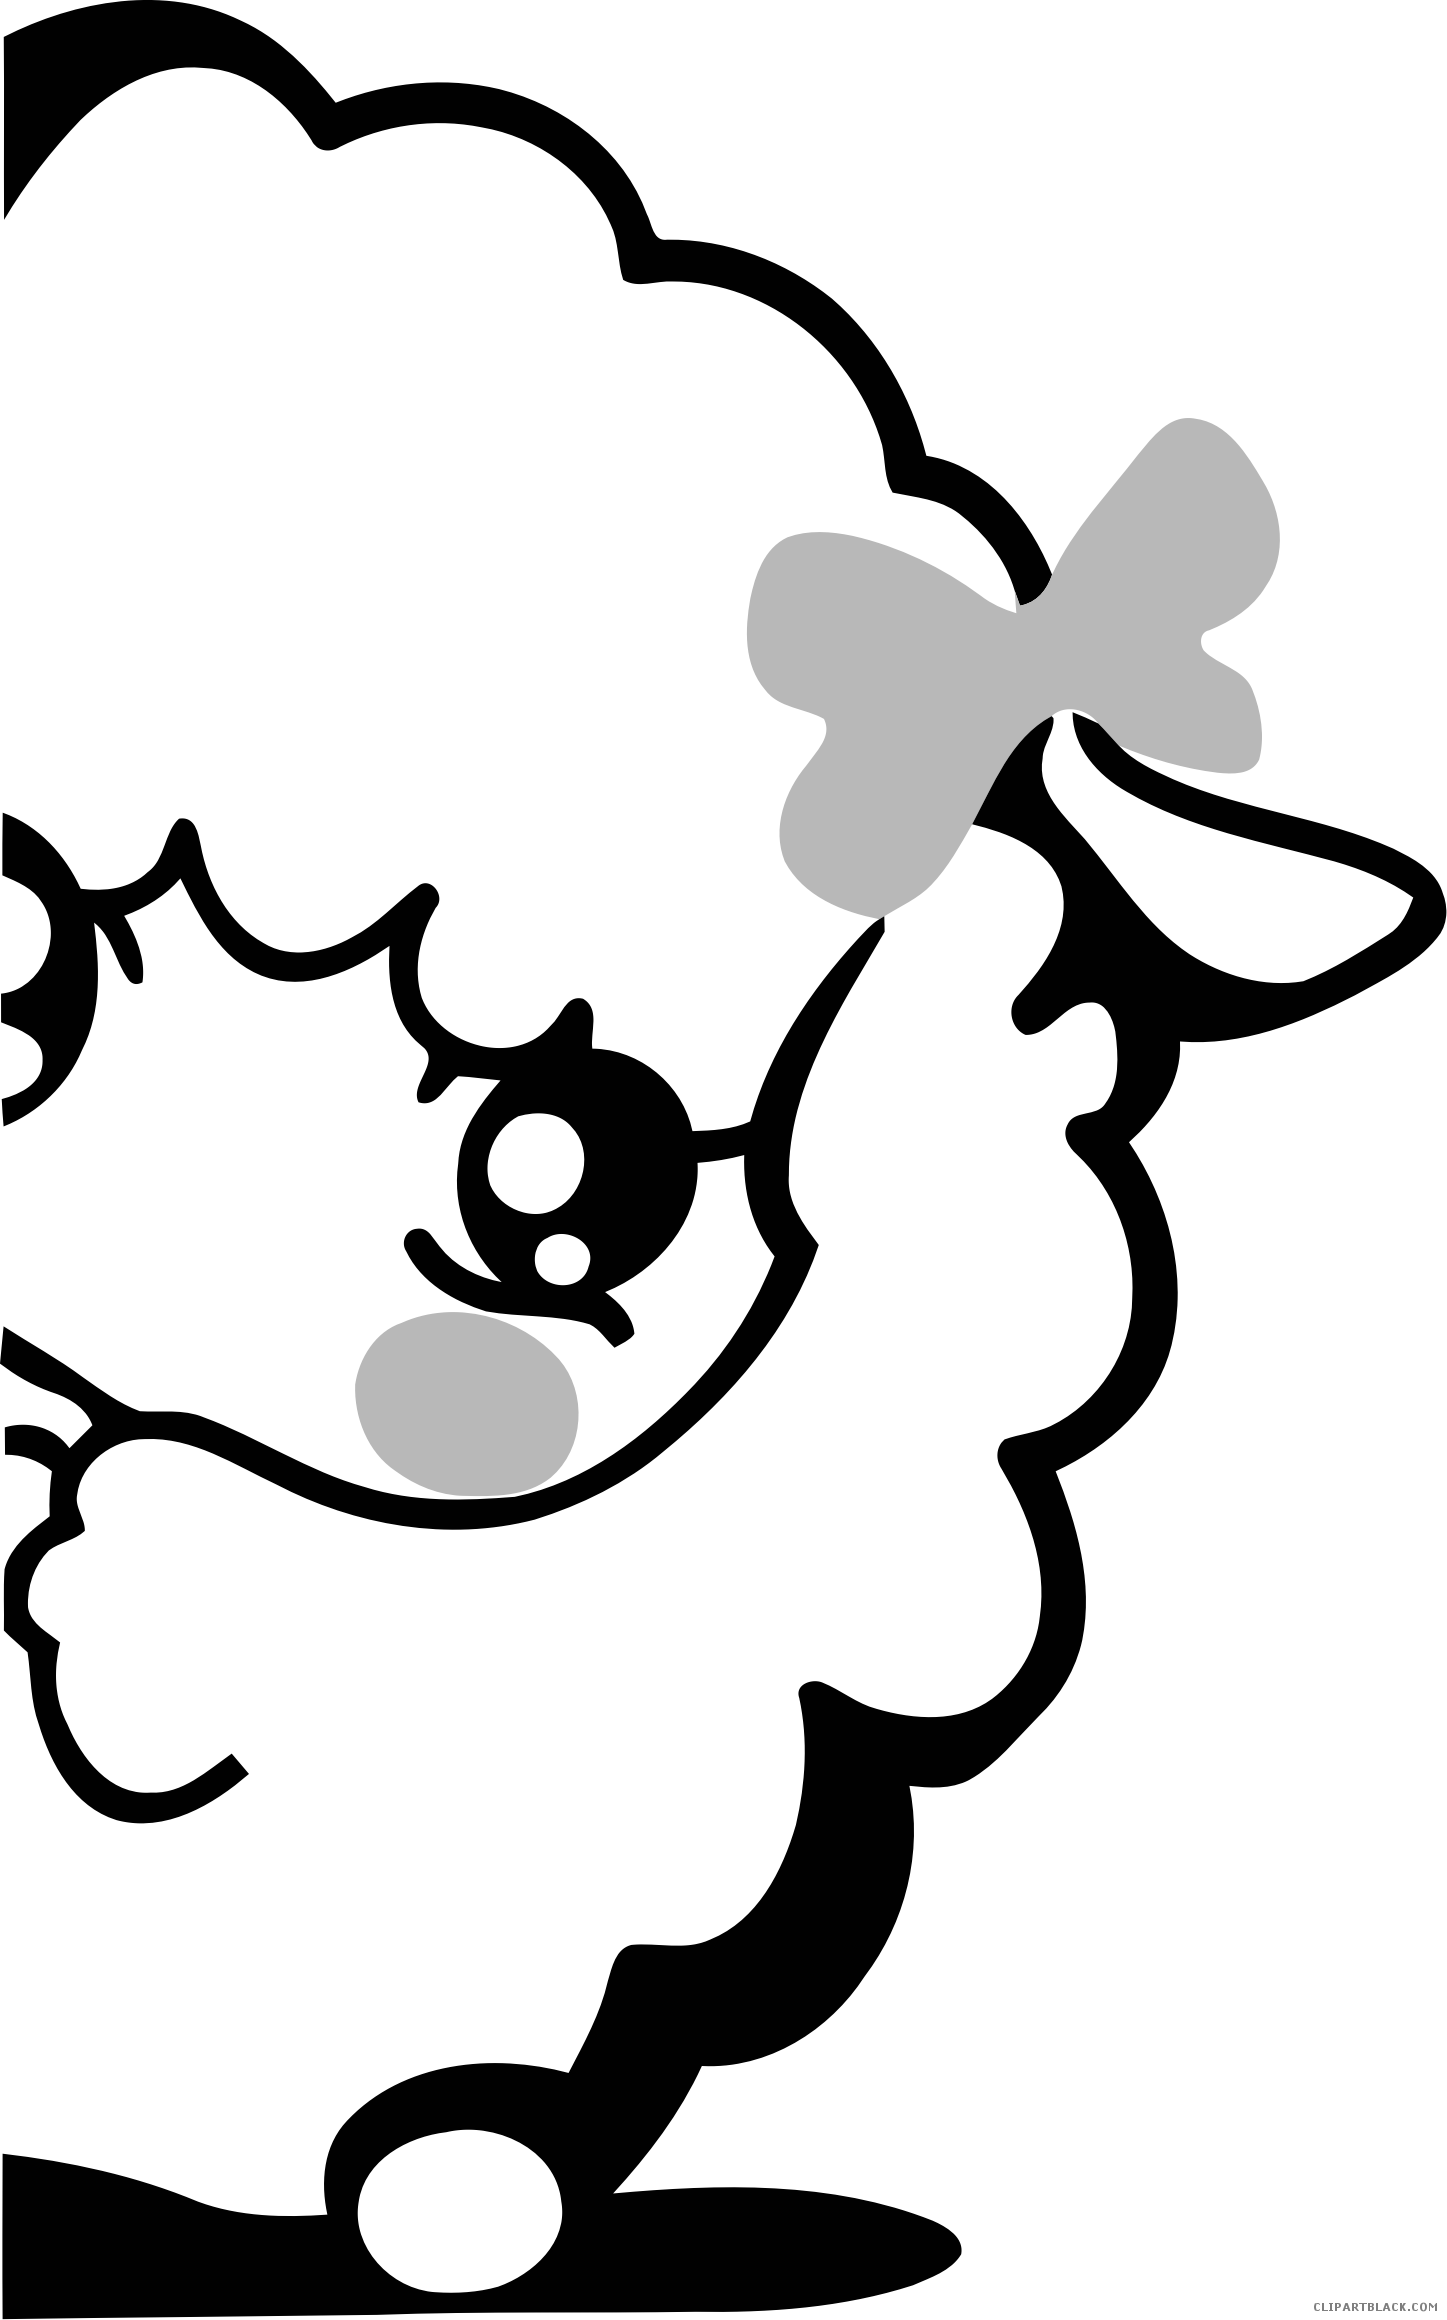 Clipartblack com animal free. Lamb clipart black and white